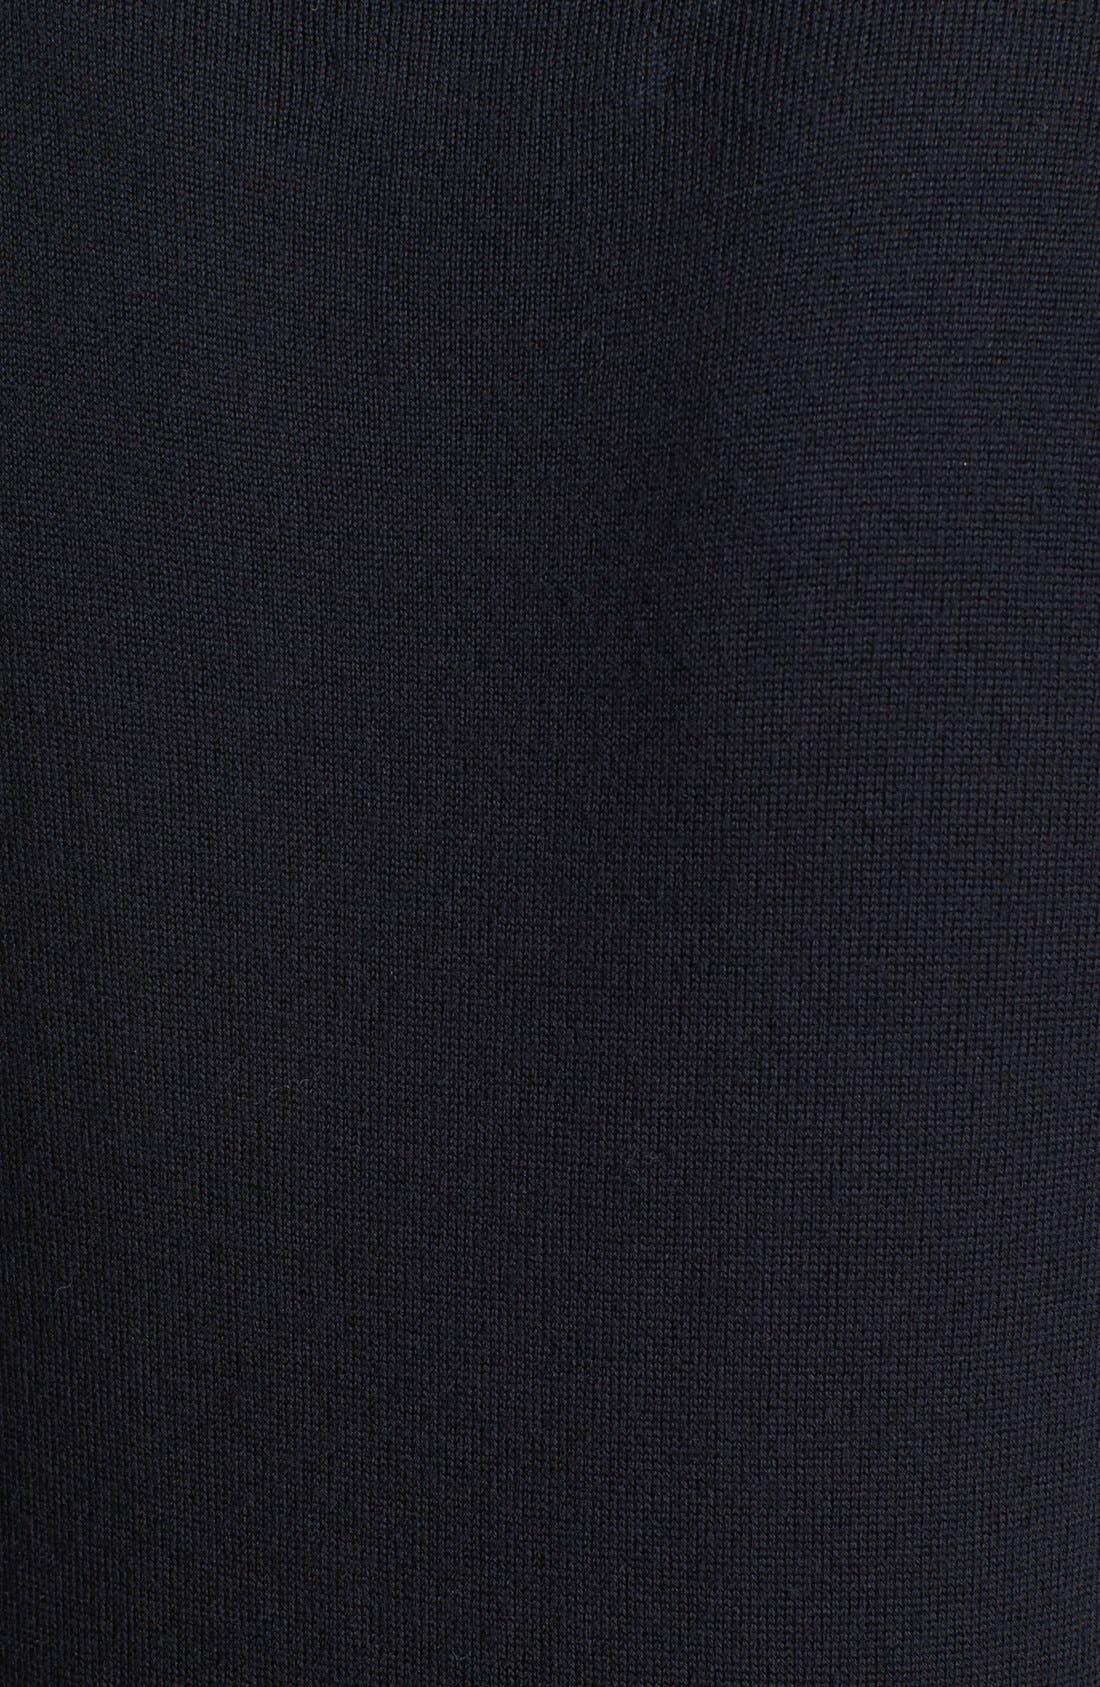 'Karsyn Kiss & Tell' Sweater,                             Alternate thumbnail 3, color,                             009